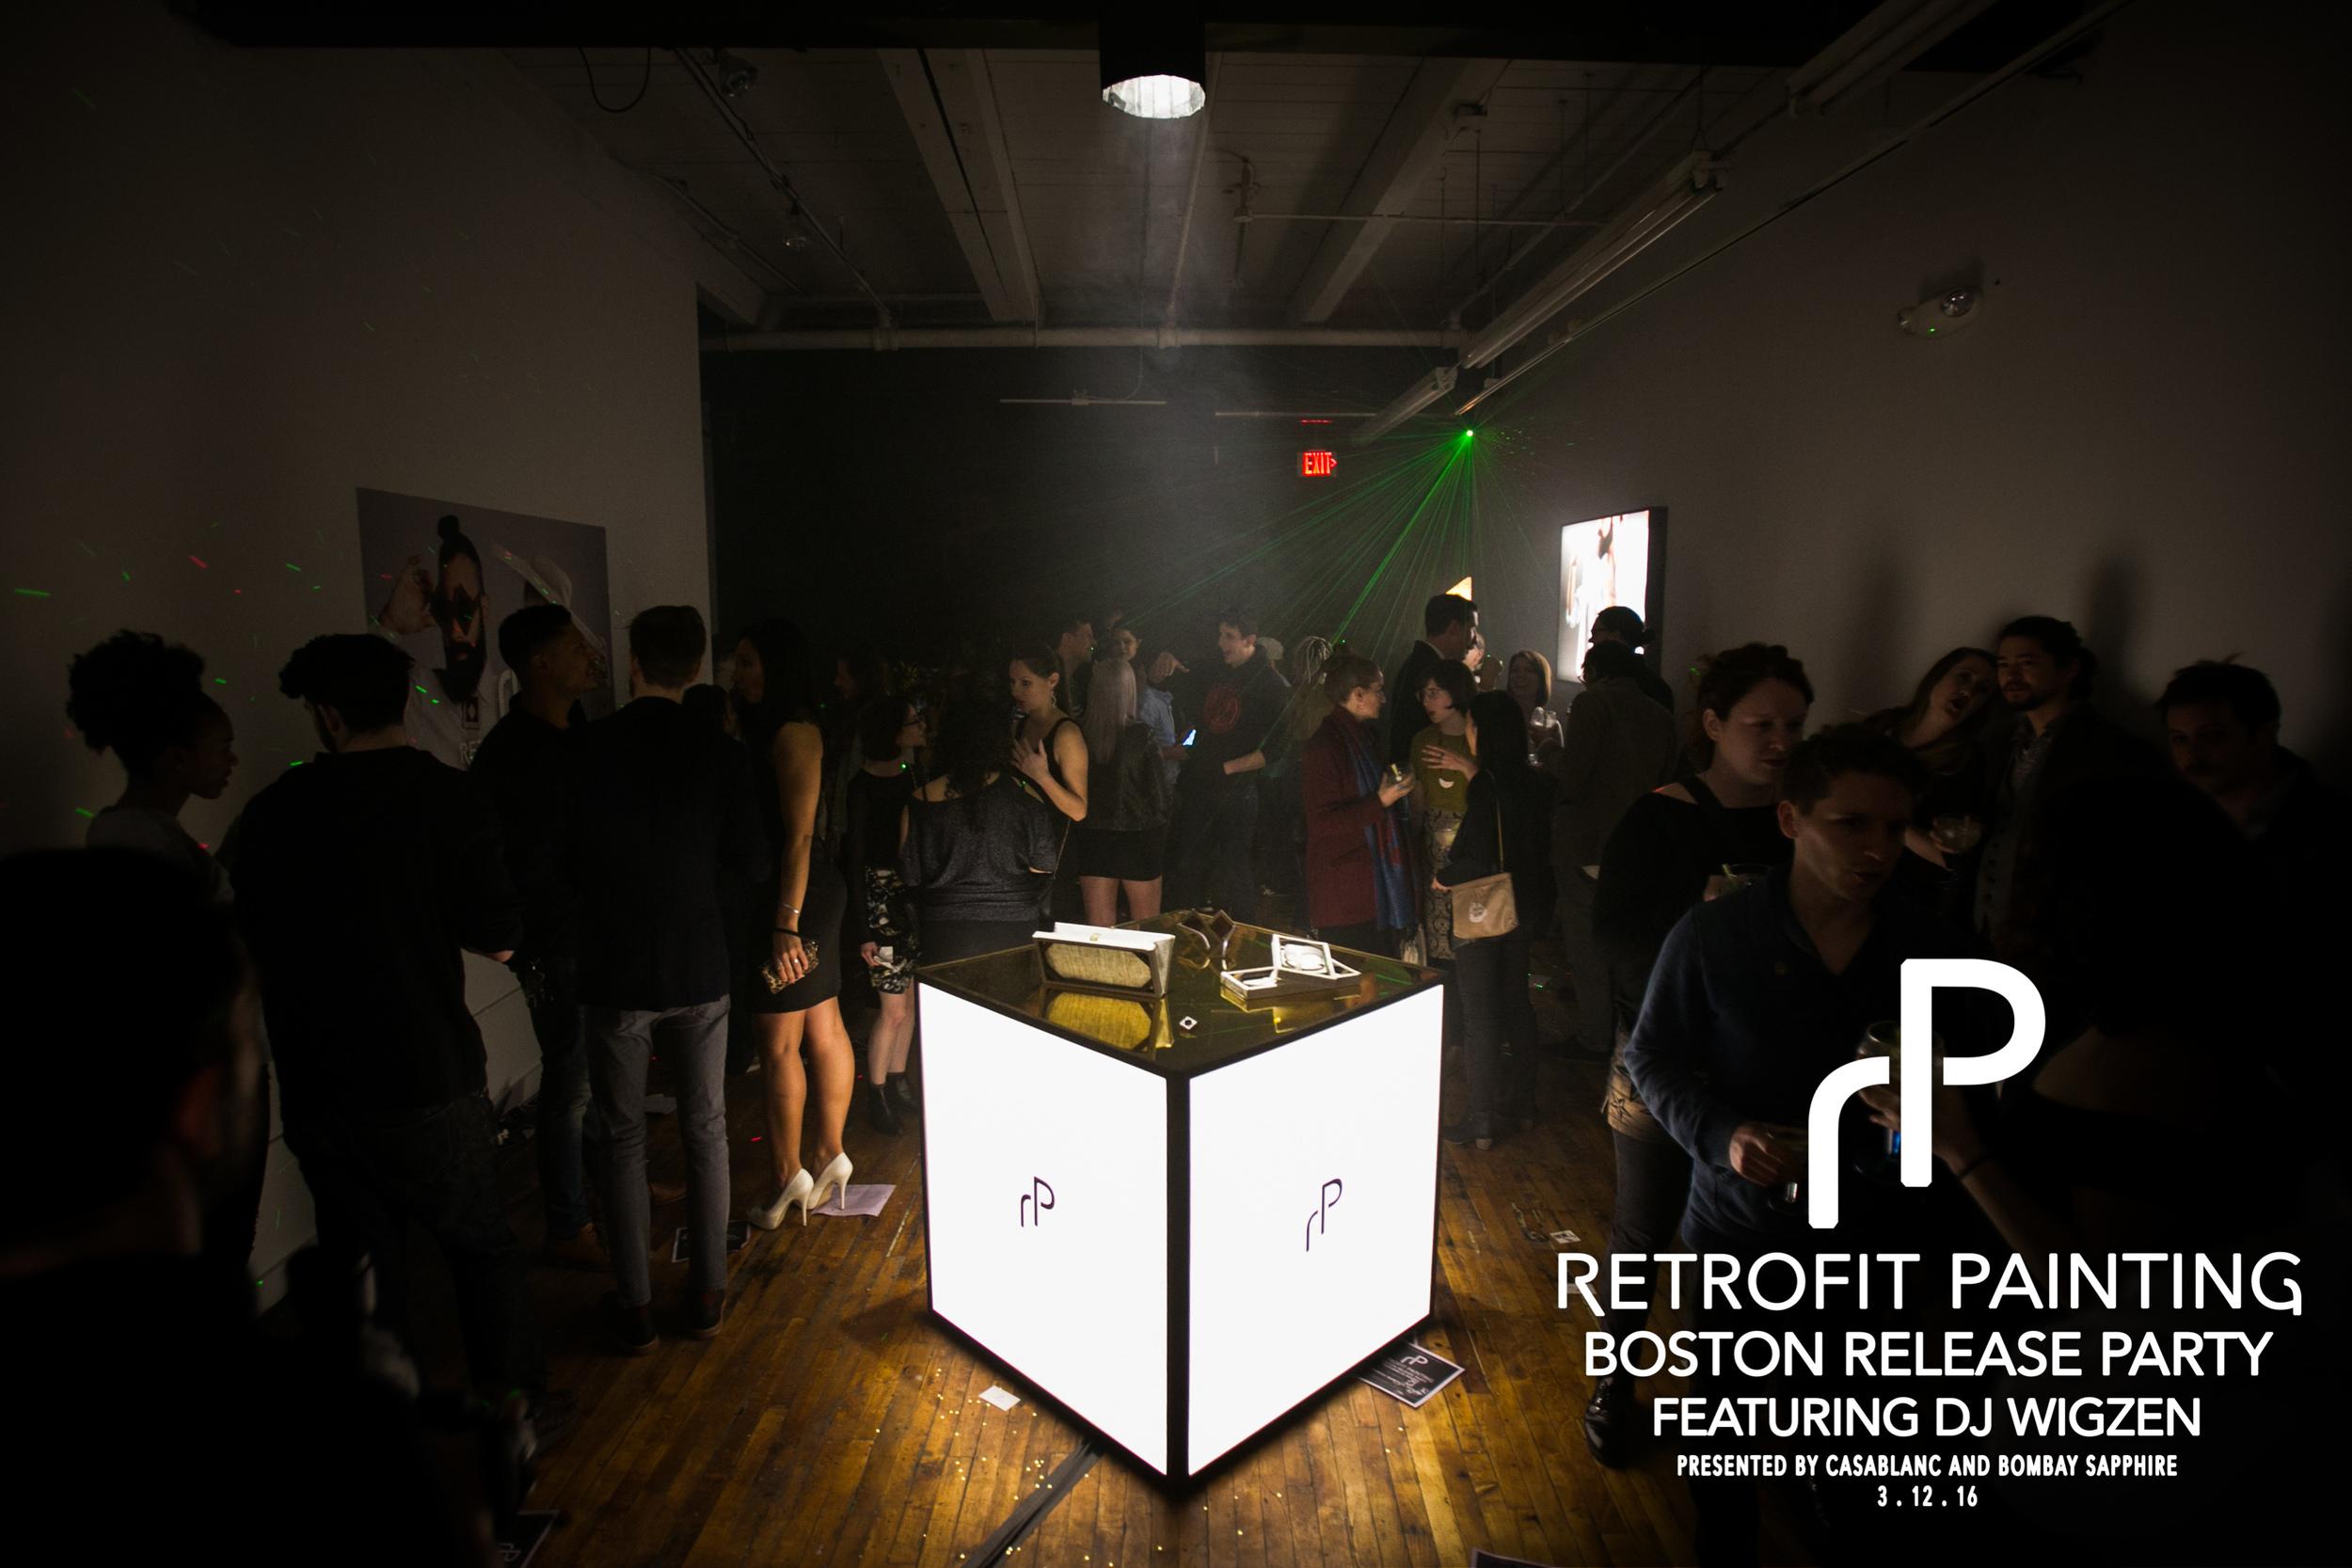 Retrofit Painting Boston Release Party 0203.jpg